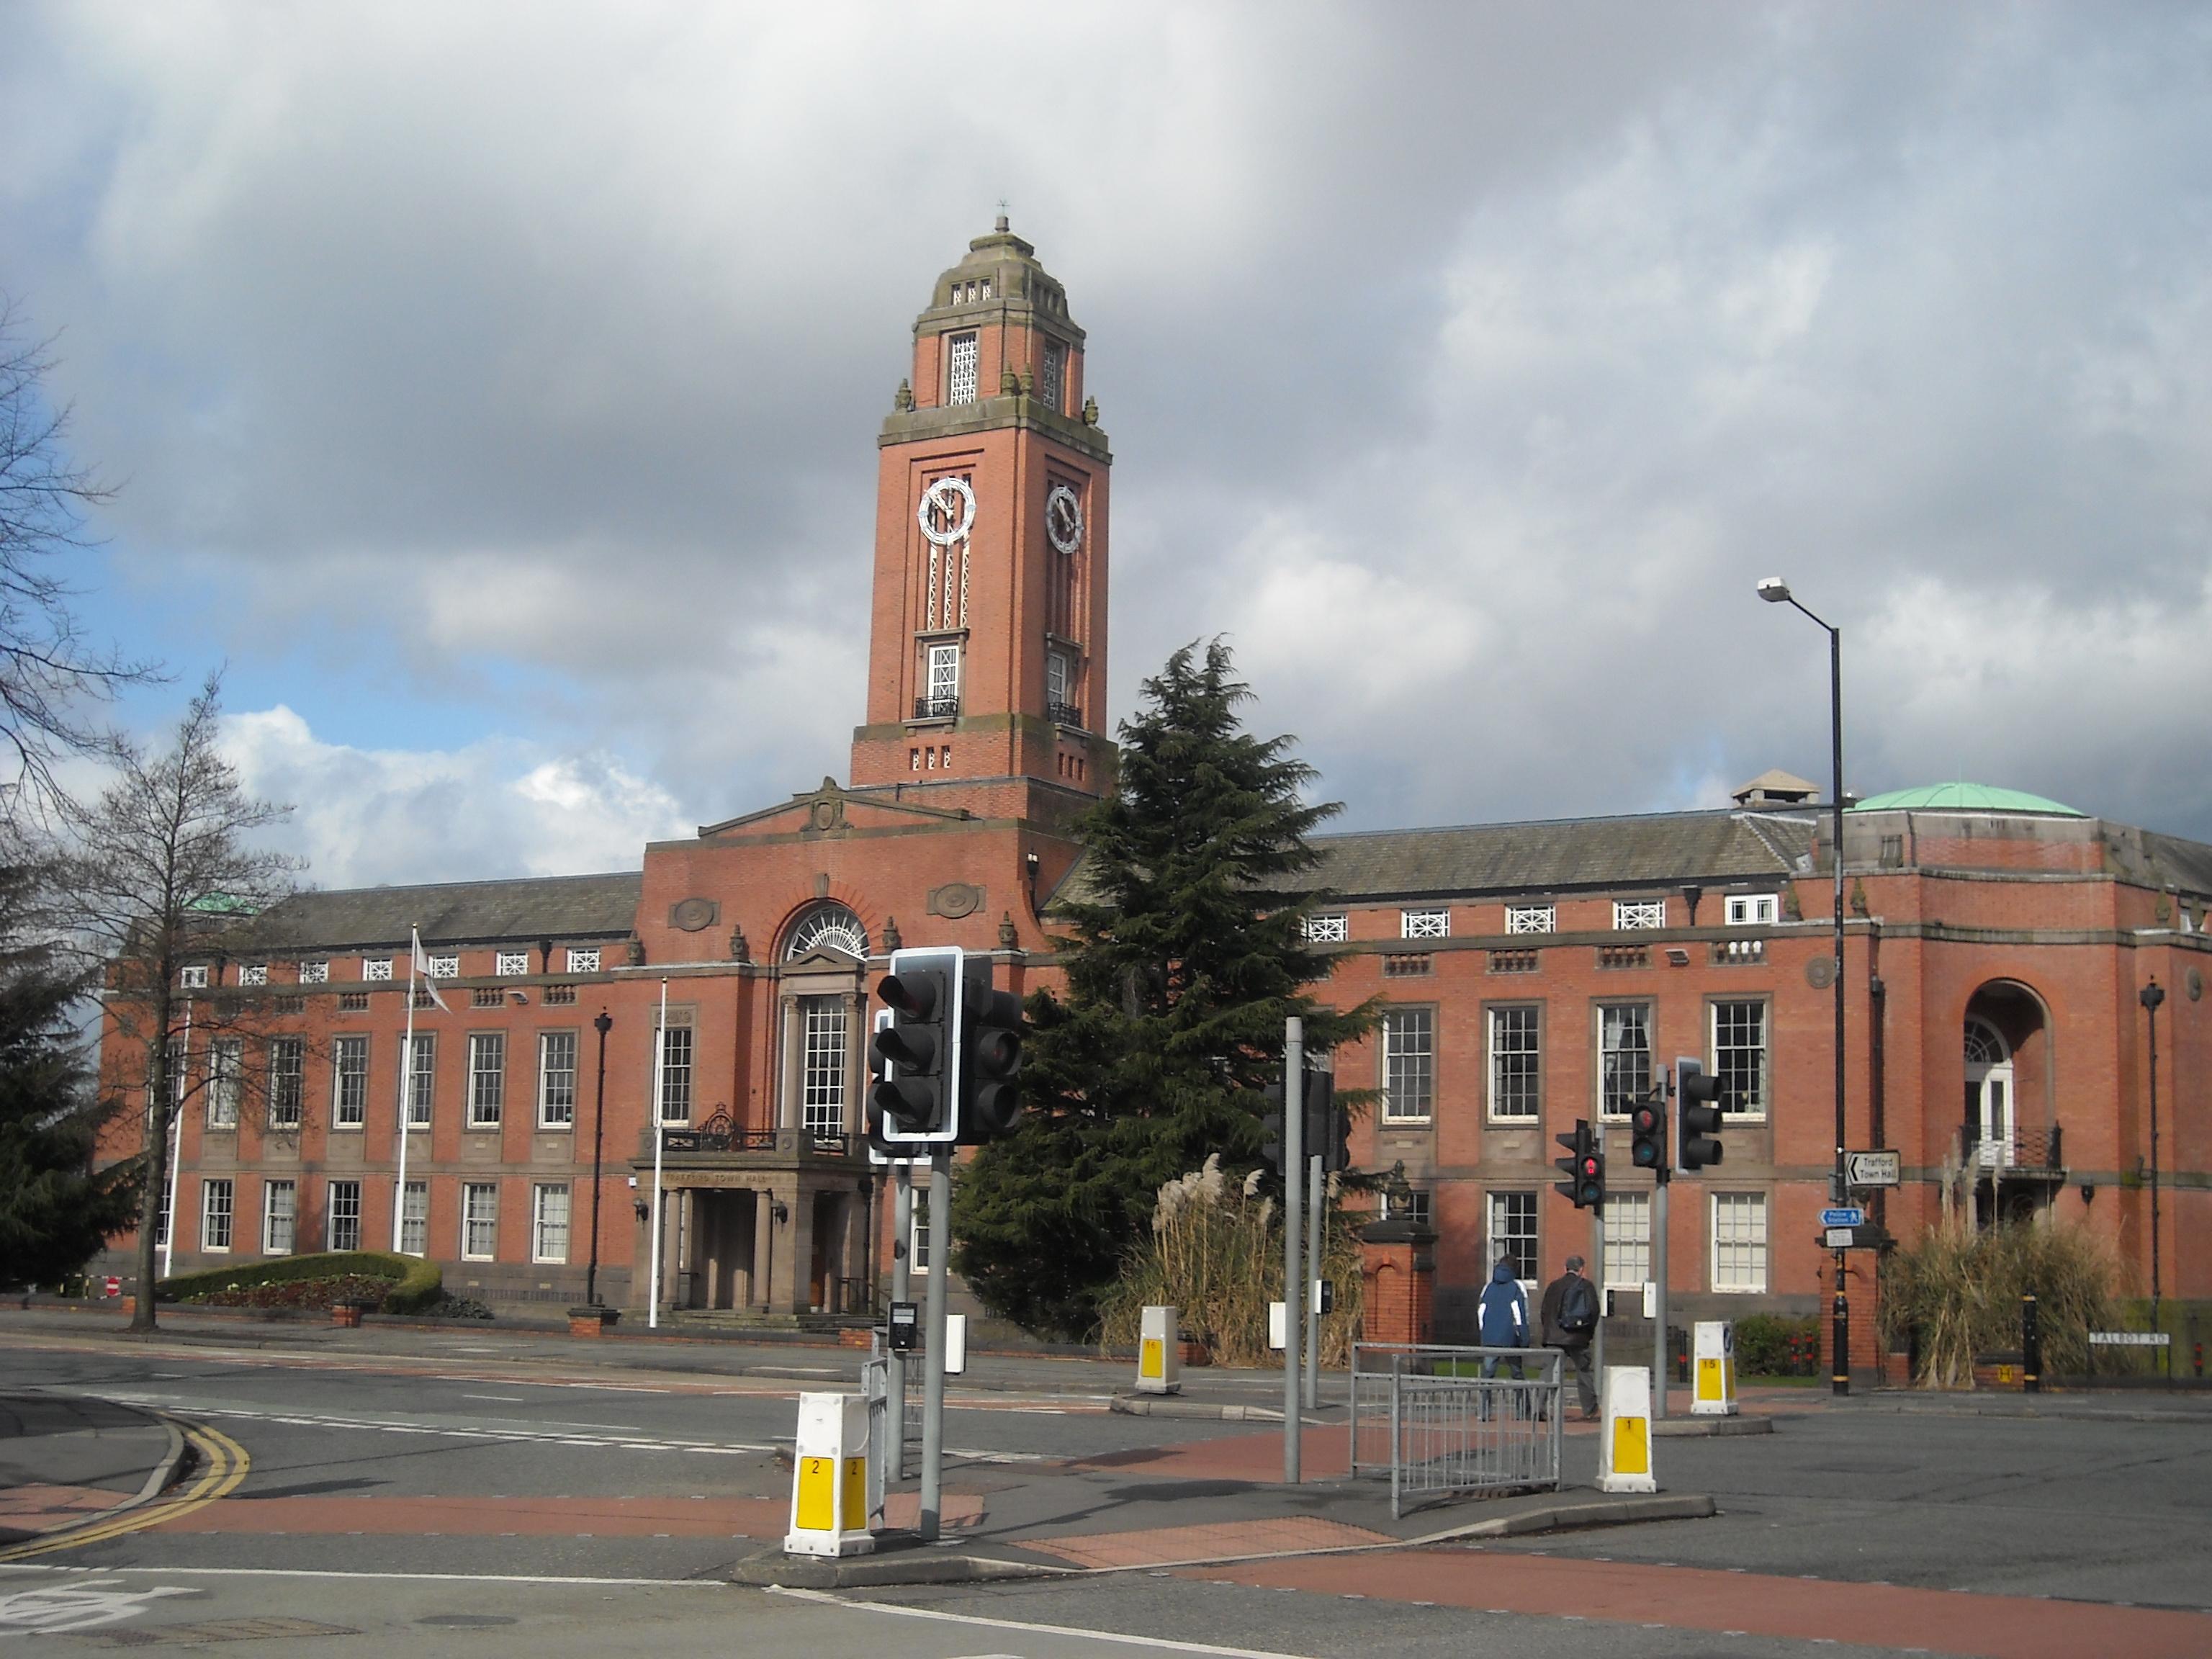 File:Trafford Town Hall, Stretford.jpg - Wikimedia Commonstrafford town